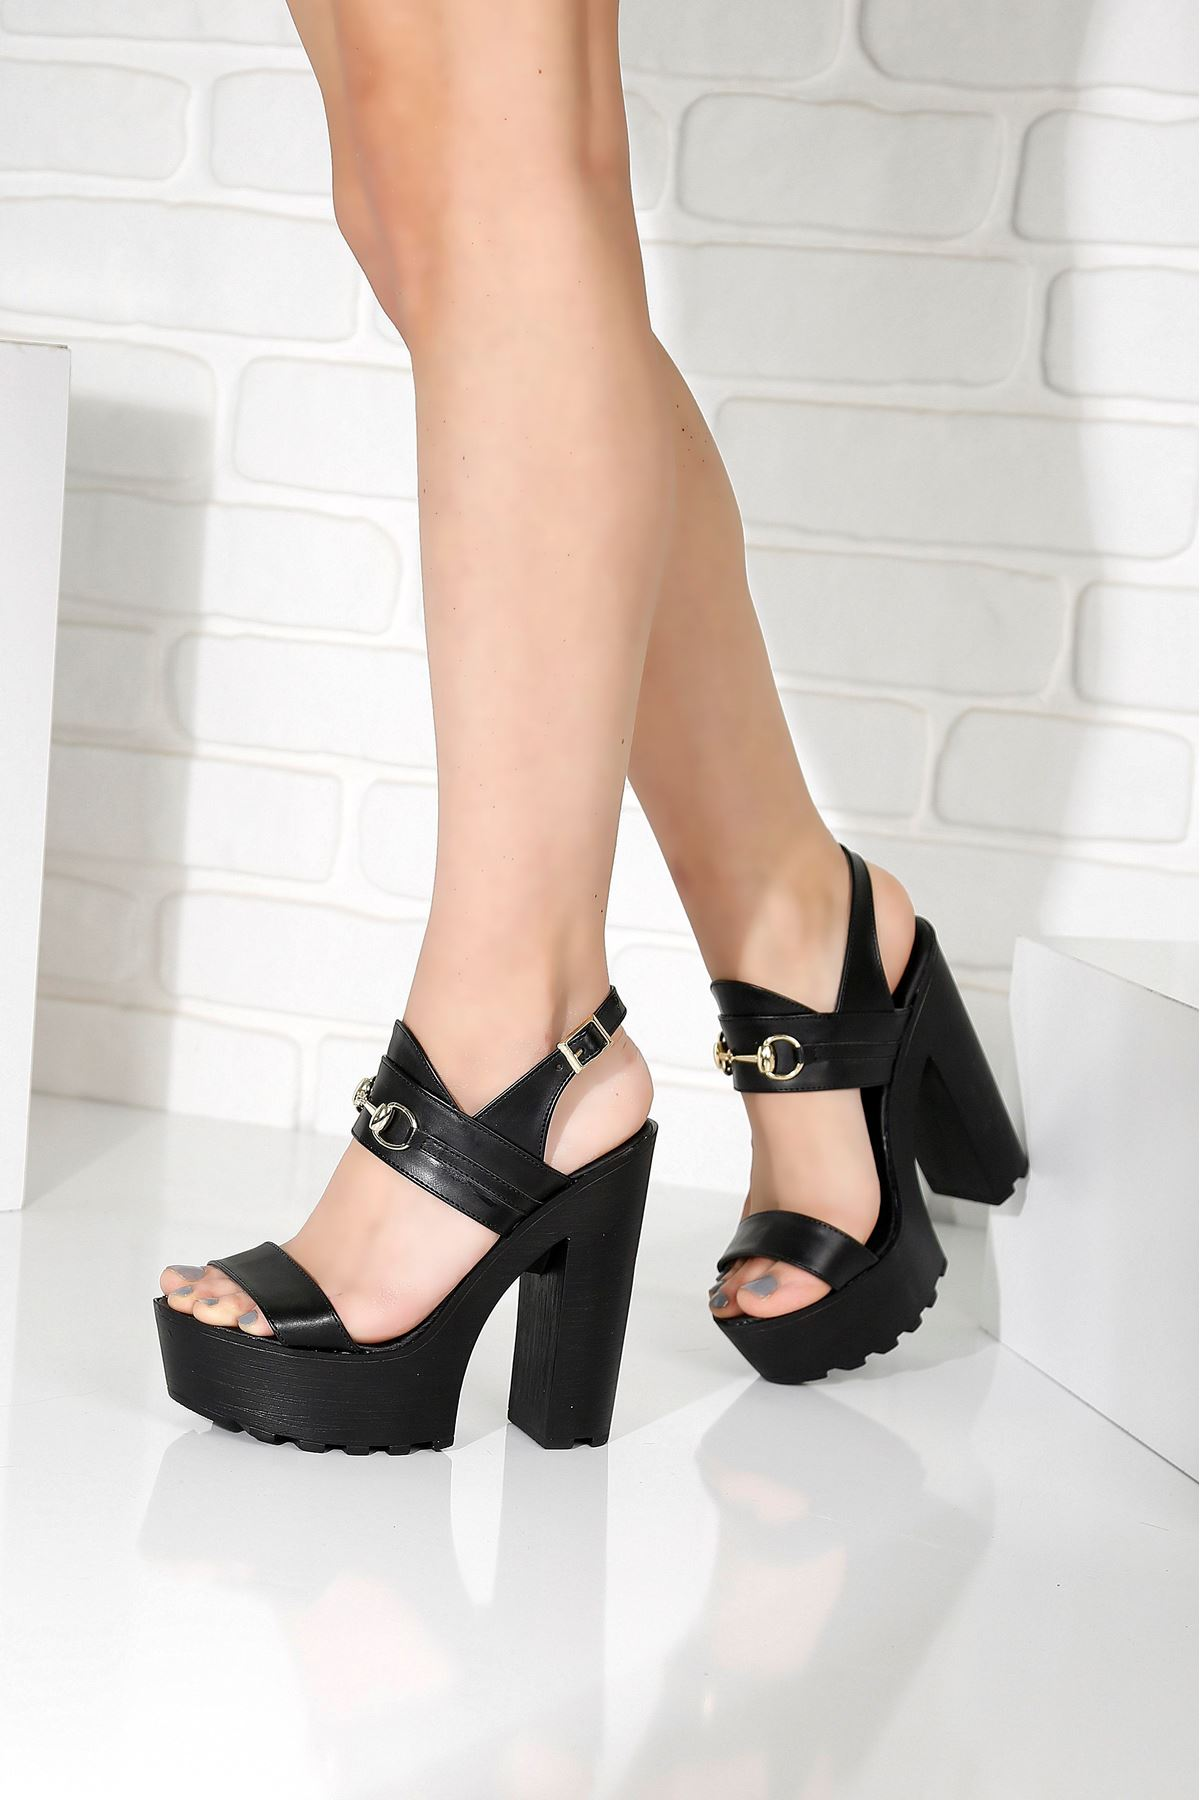 KLEOPATRA Siyah Topuklu Kadın Ayakkabı